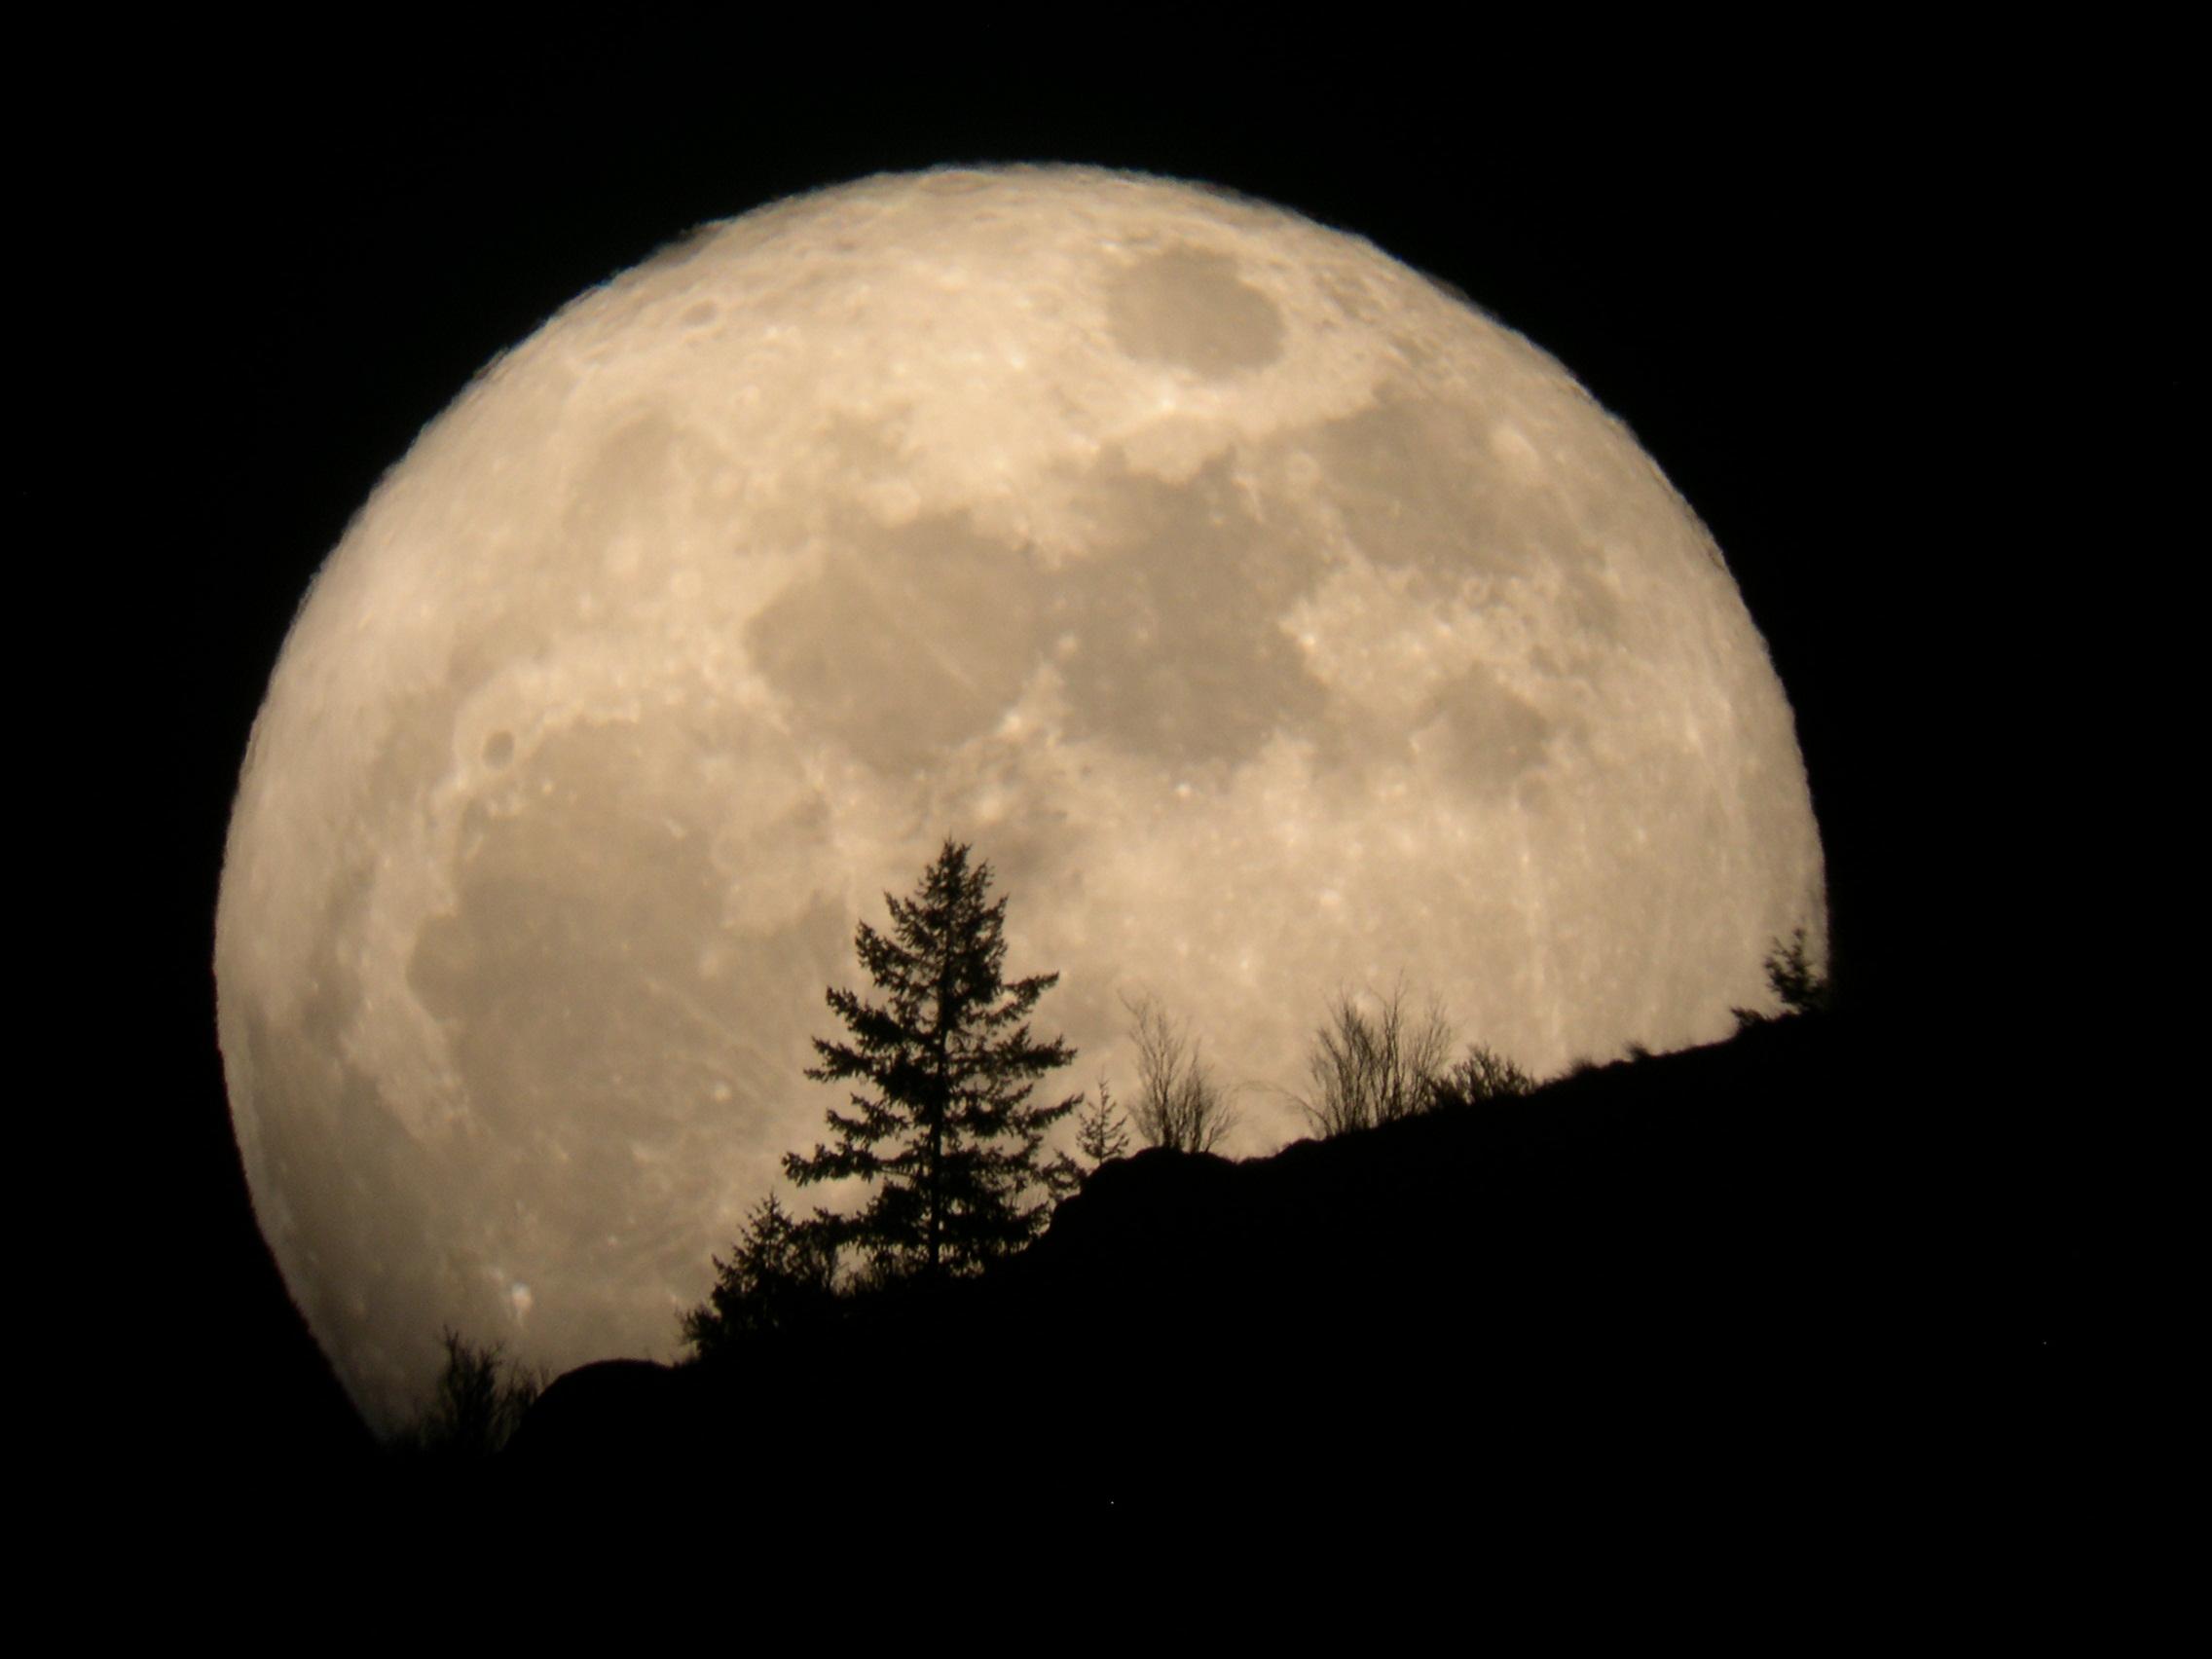 Earth's Sister Moons